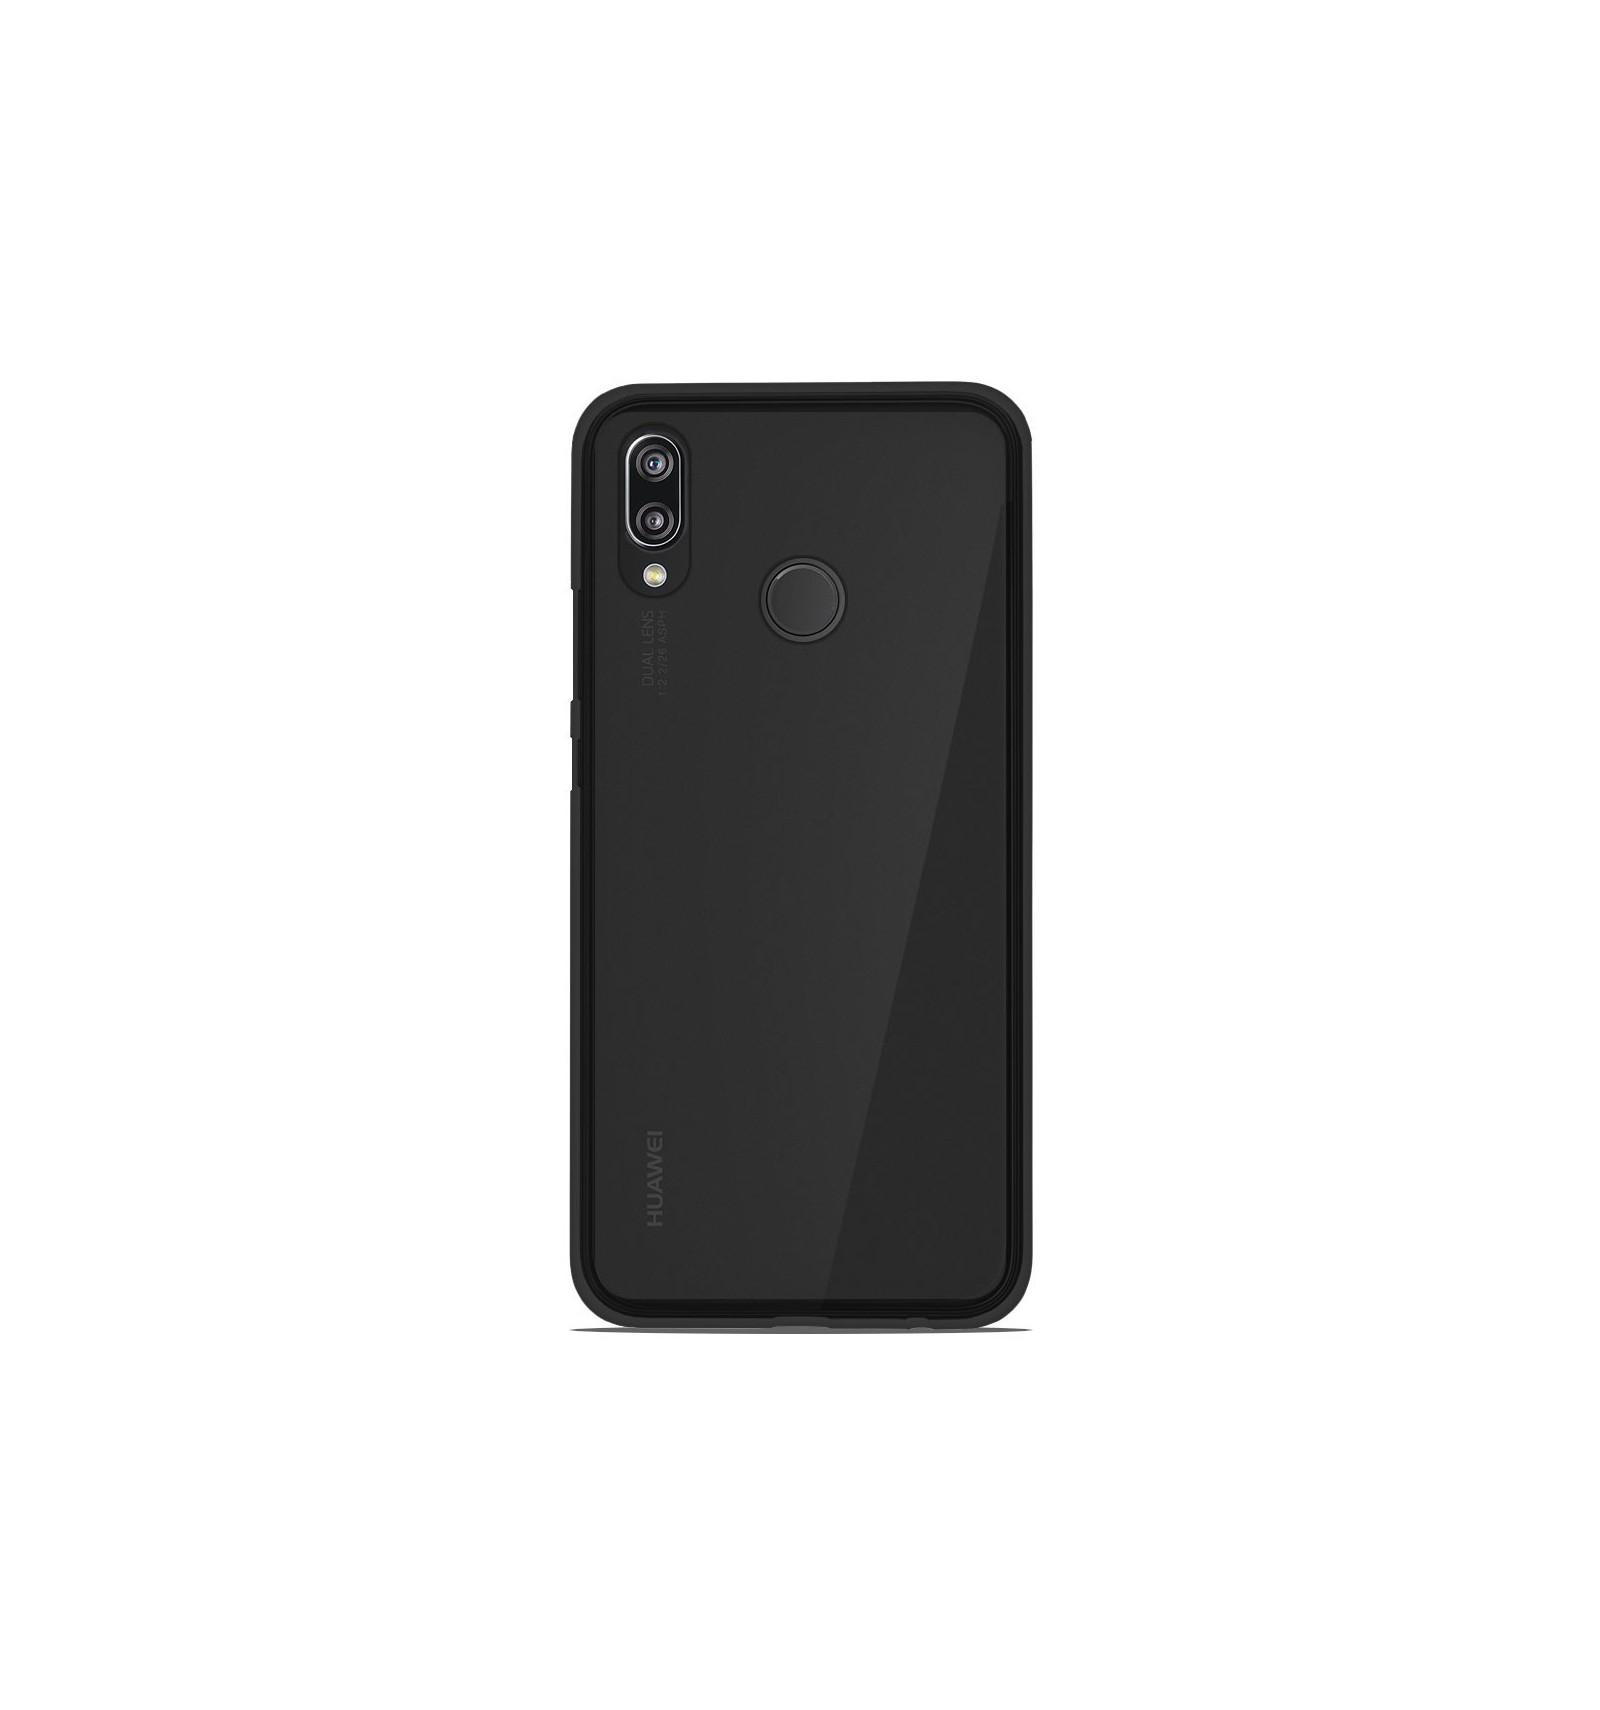 Coque Huawei P20 Lite Silicone Gel givré - Noir